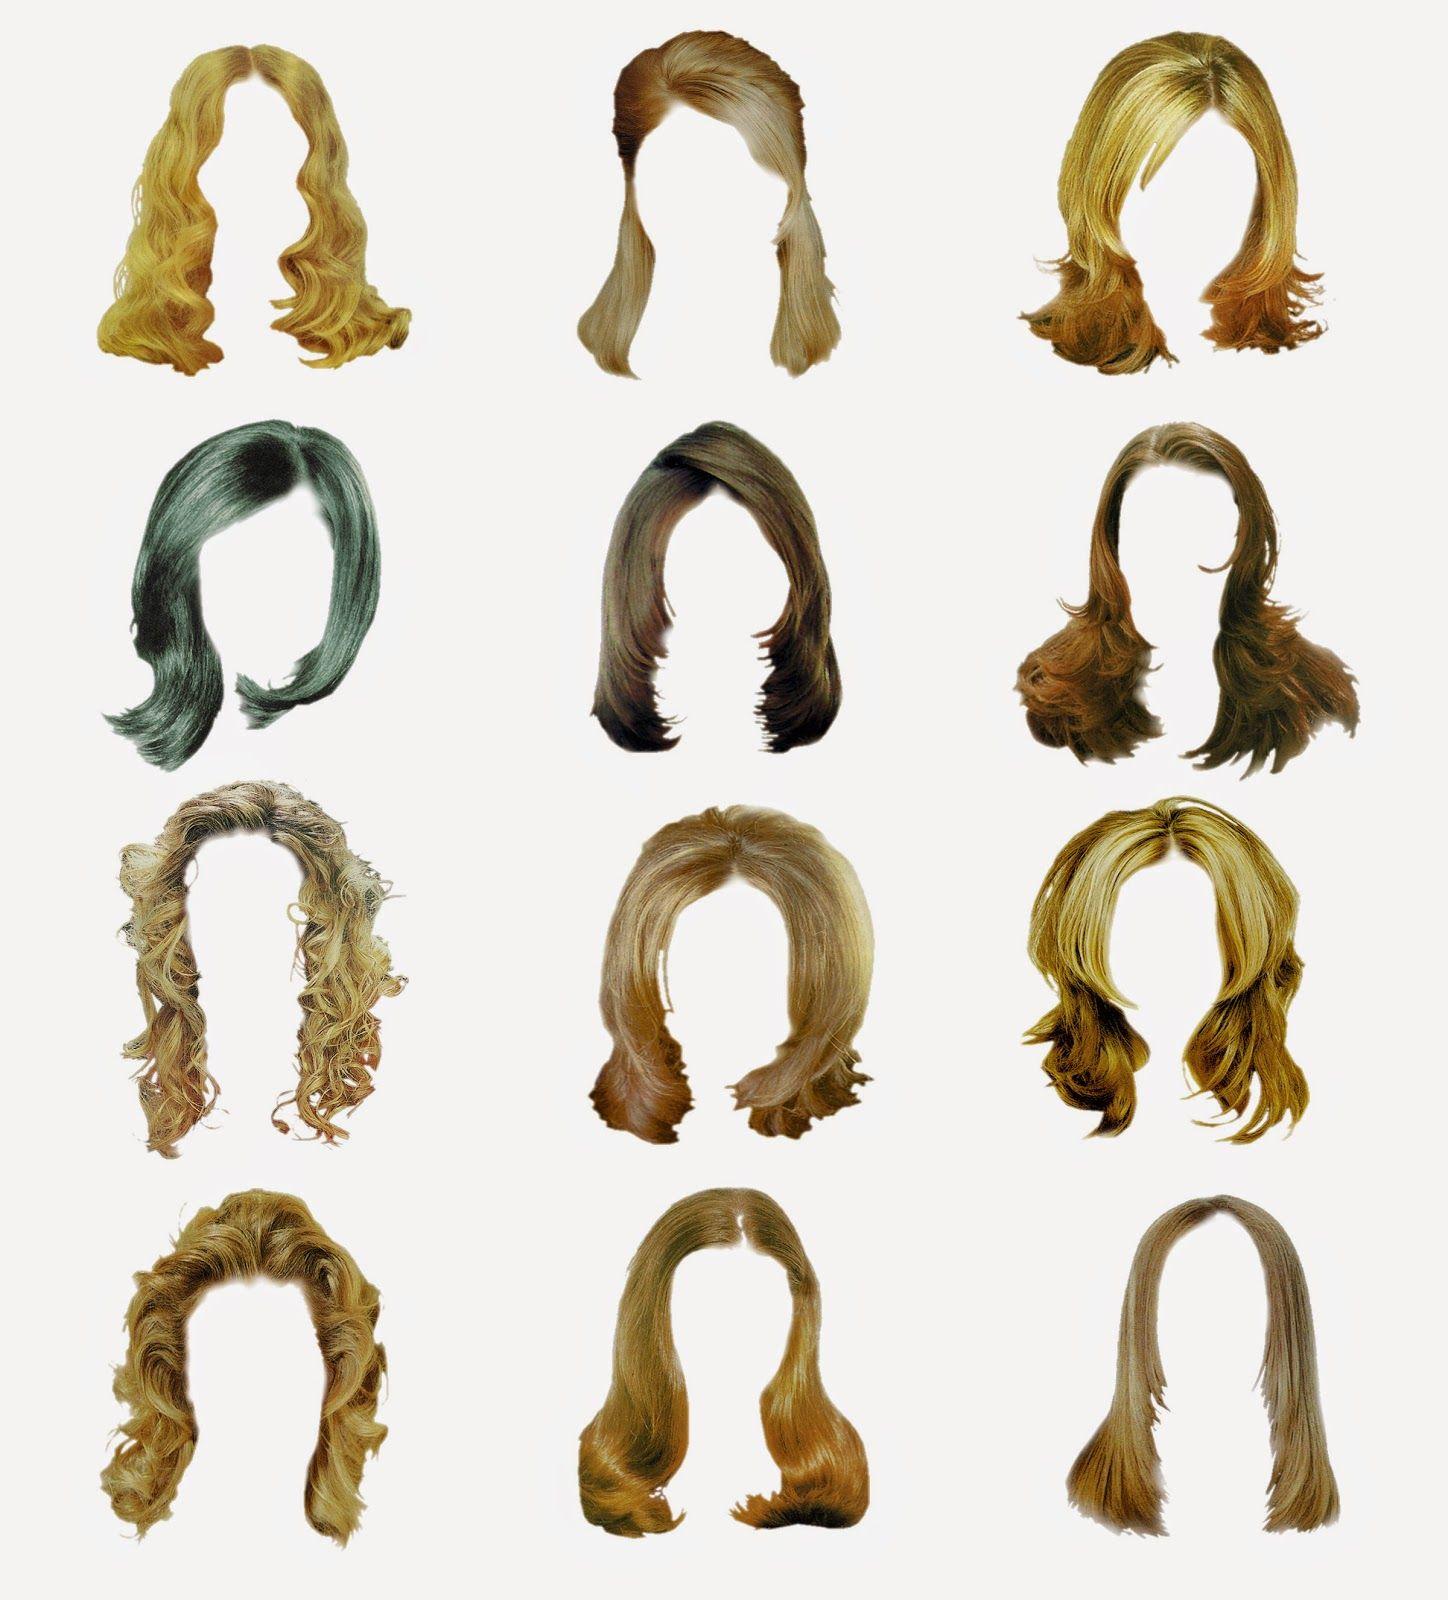 12 Women Hair Style Psd In File Lucky Studio 4u Womens Hairstyles Boho Hairstyles Shoulder Hair